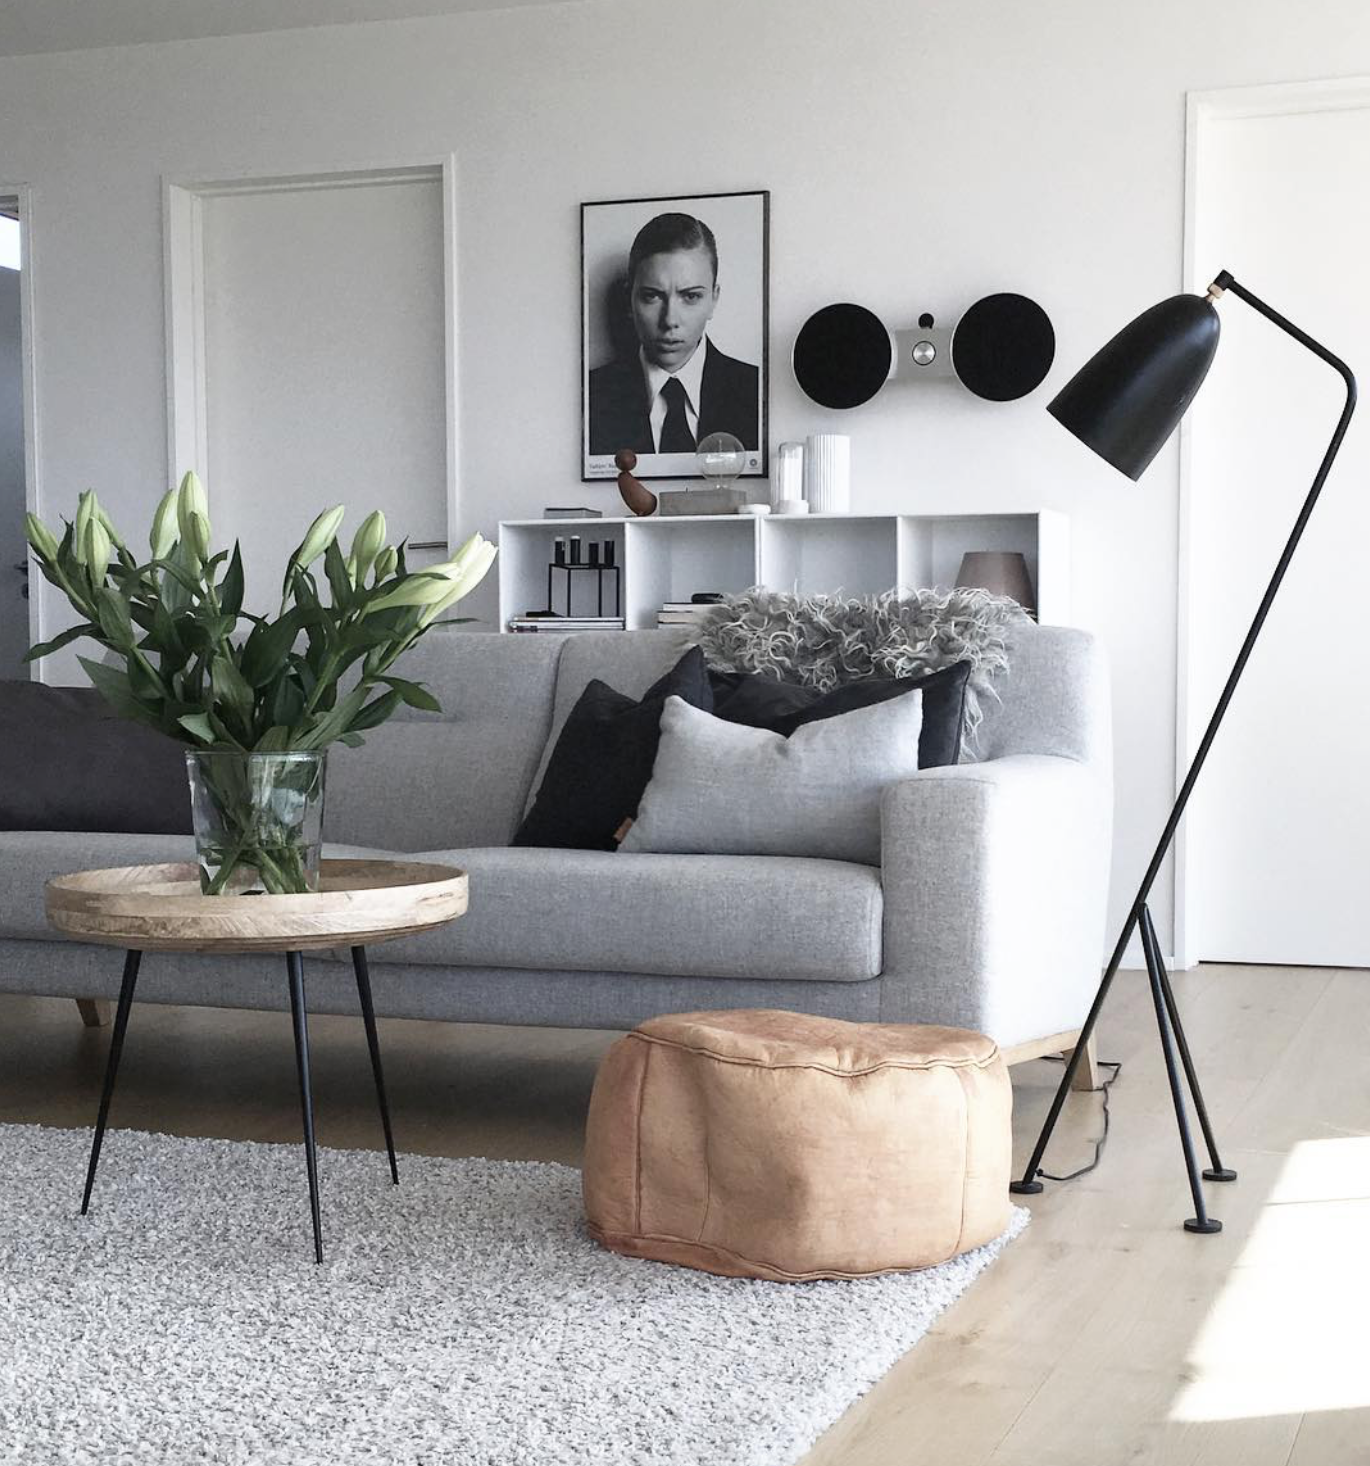 5 Gorgeous Scandinavian Bathroom Ideas: 28+ Gorgeous Scandinavian Interior Design Ideas You Should